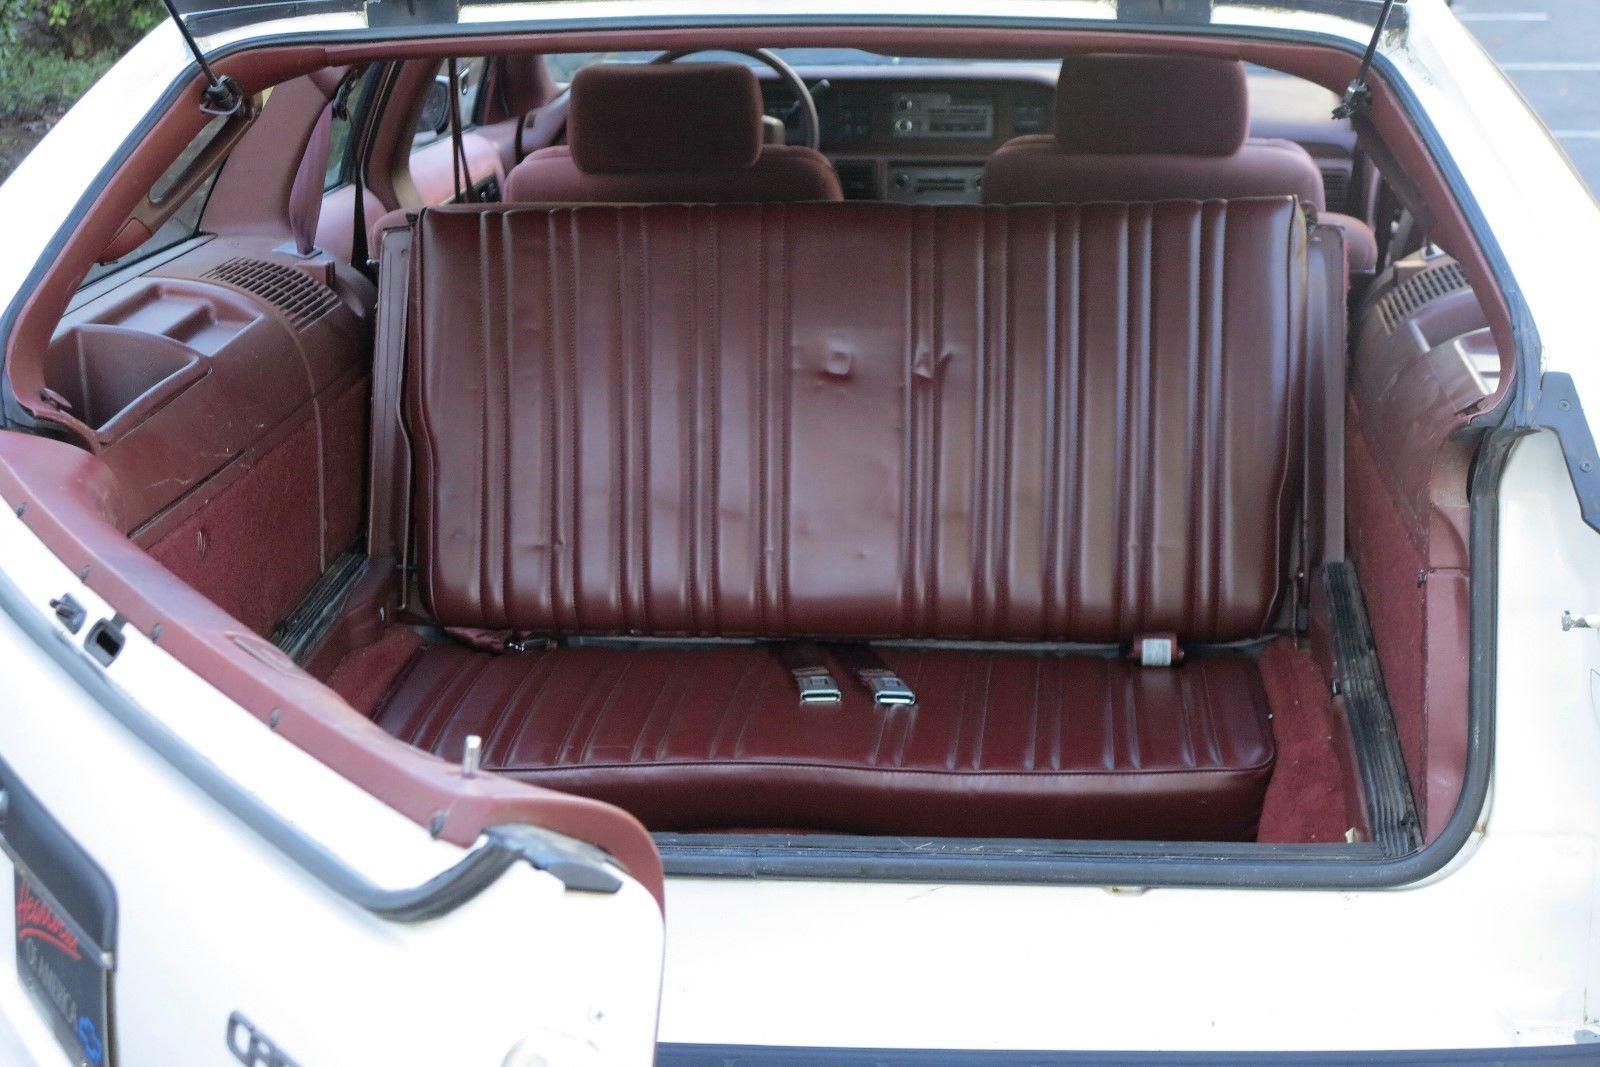 1991 Chevrolet Caprice Classic Wagon third row rear seat